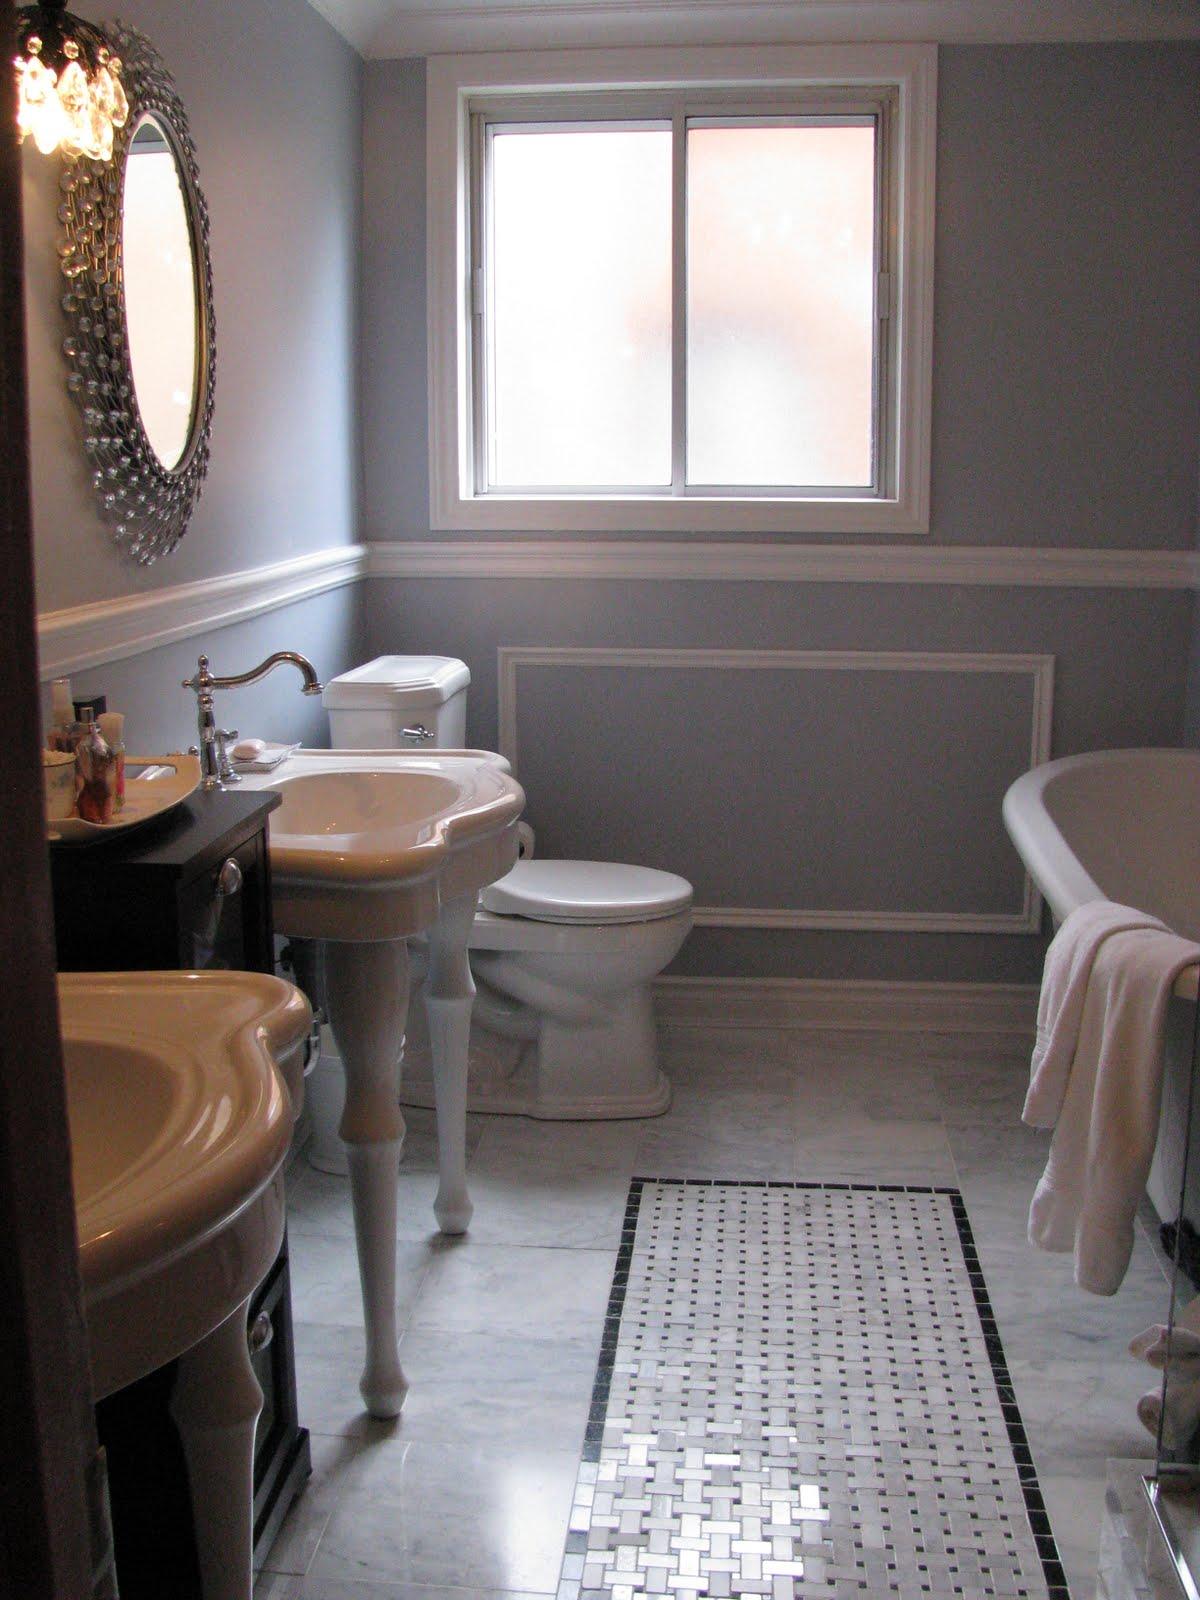 Remodelaholic Gorgeous Complete Bathroom Transformation Gut - Rebuild bathroom for small bathroom ideas